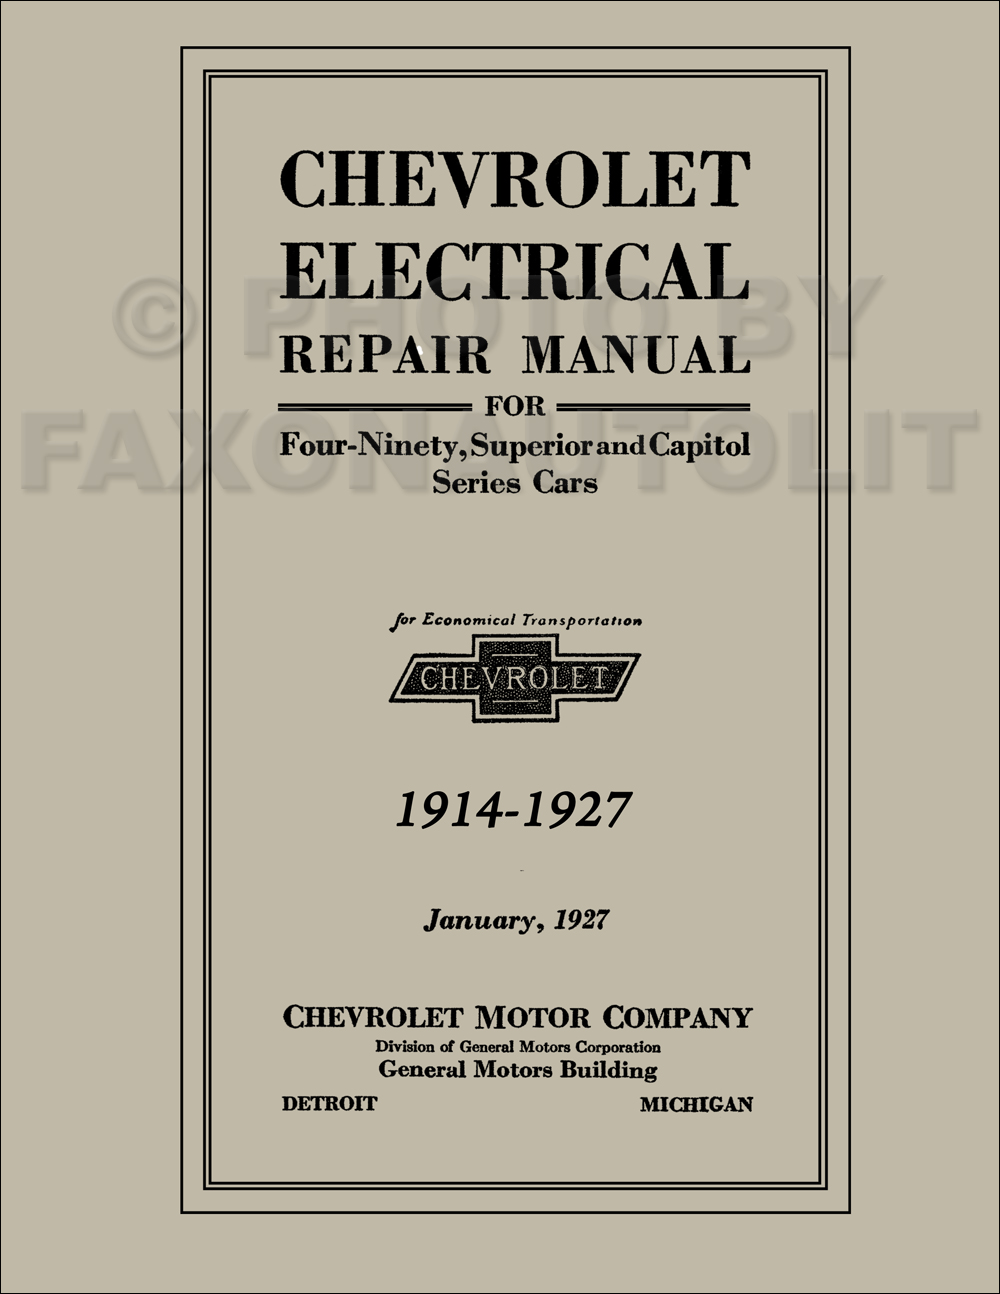 medium resolution of 1926 chevrolet wiring diagram wire management wiring diagram 1926 chevy wiring diagram